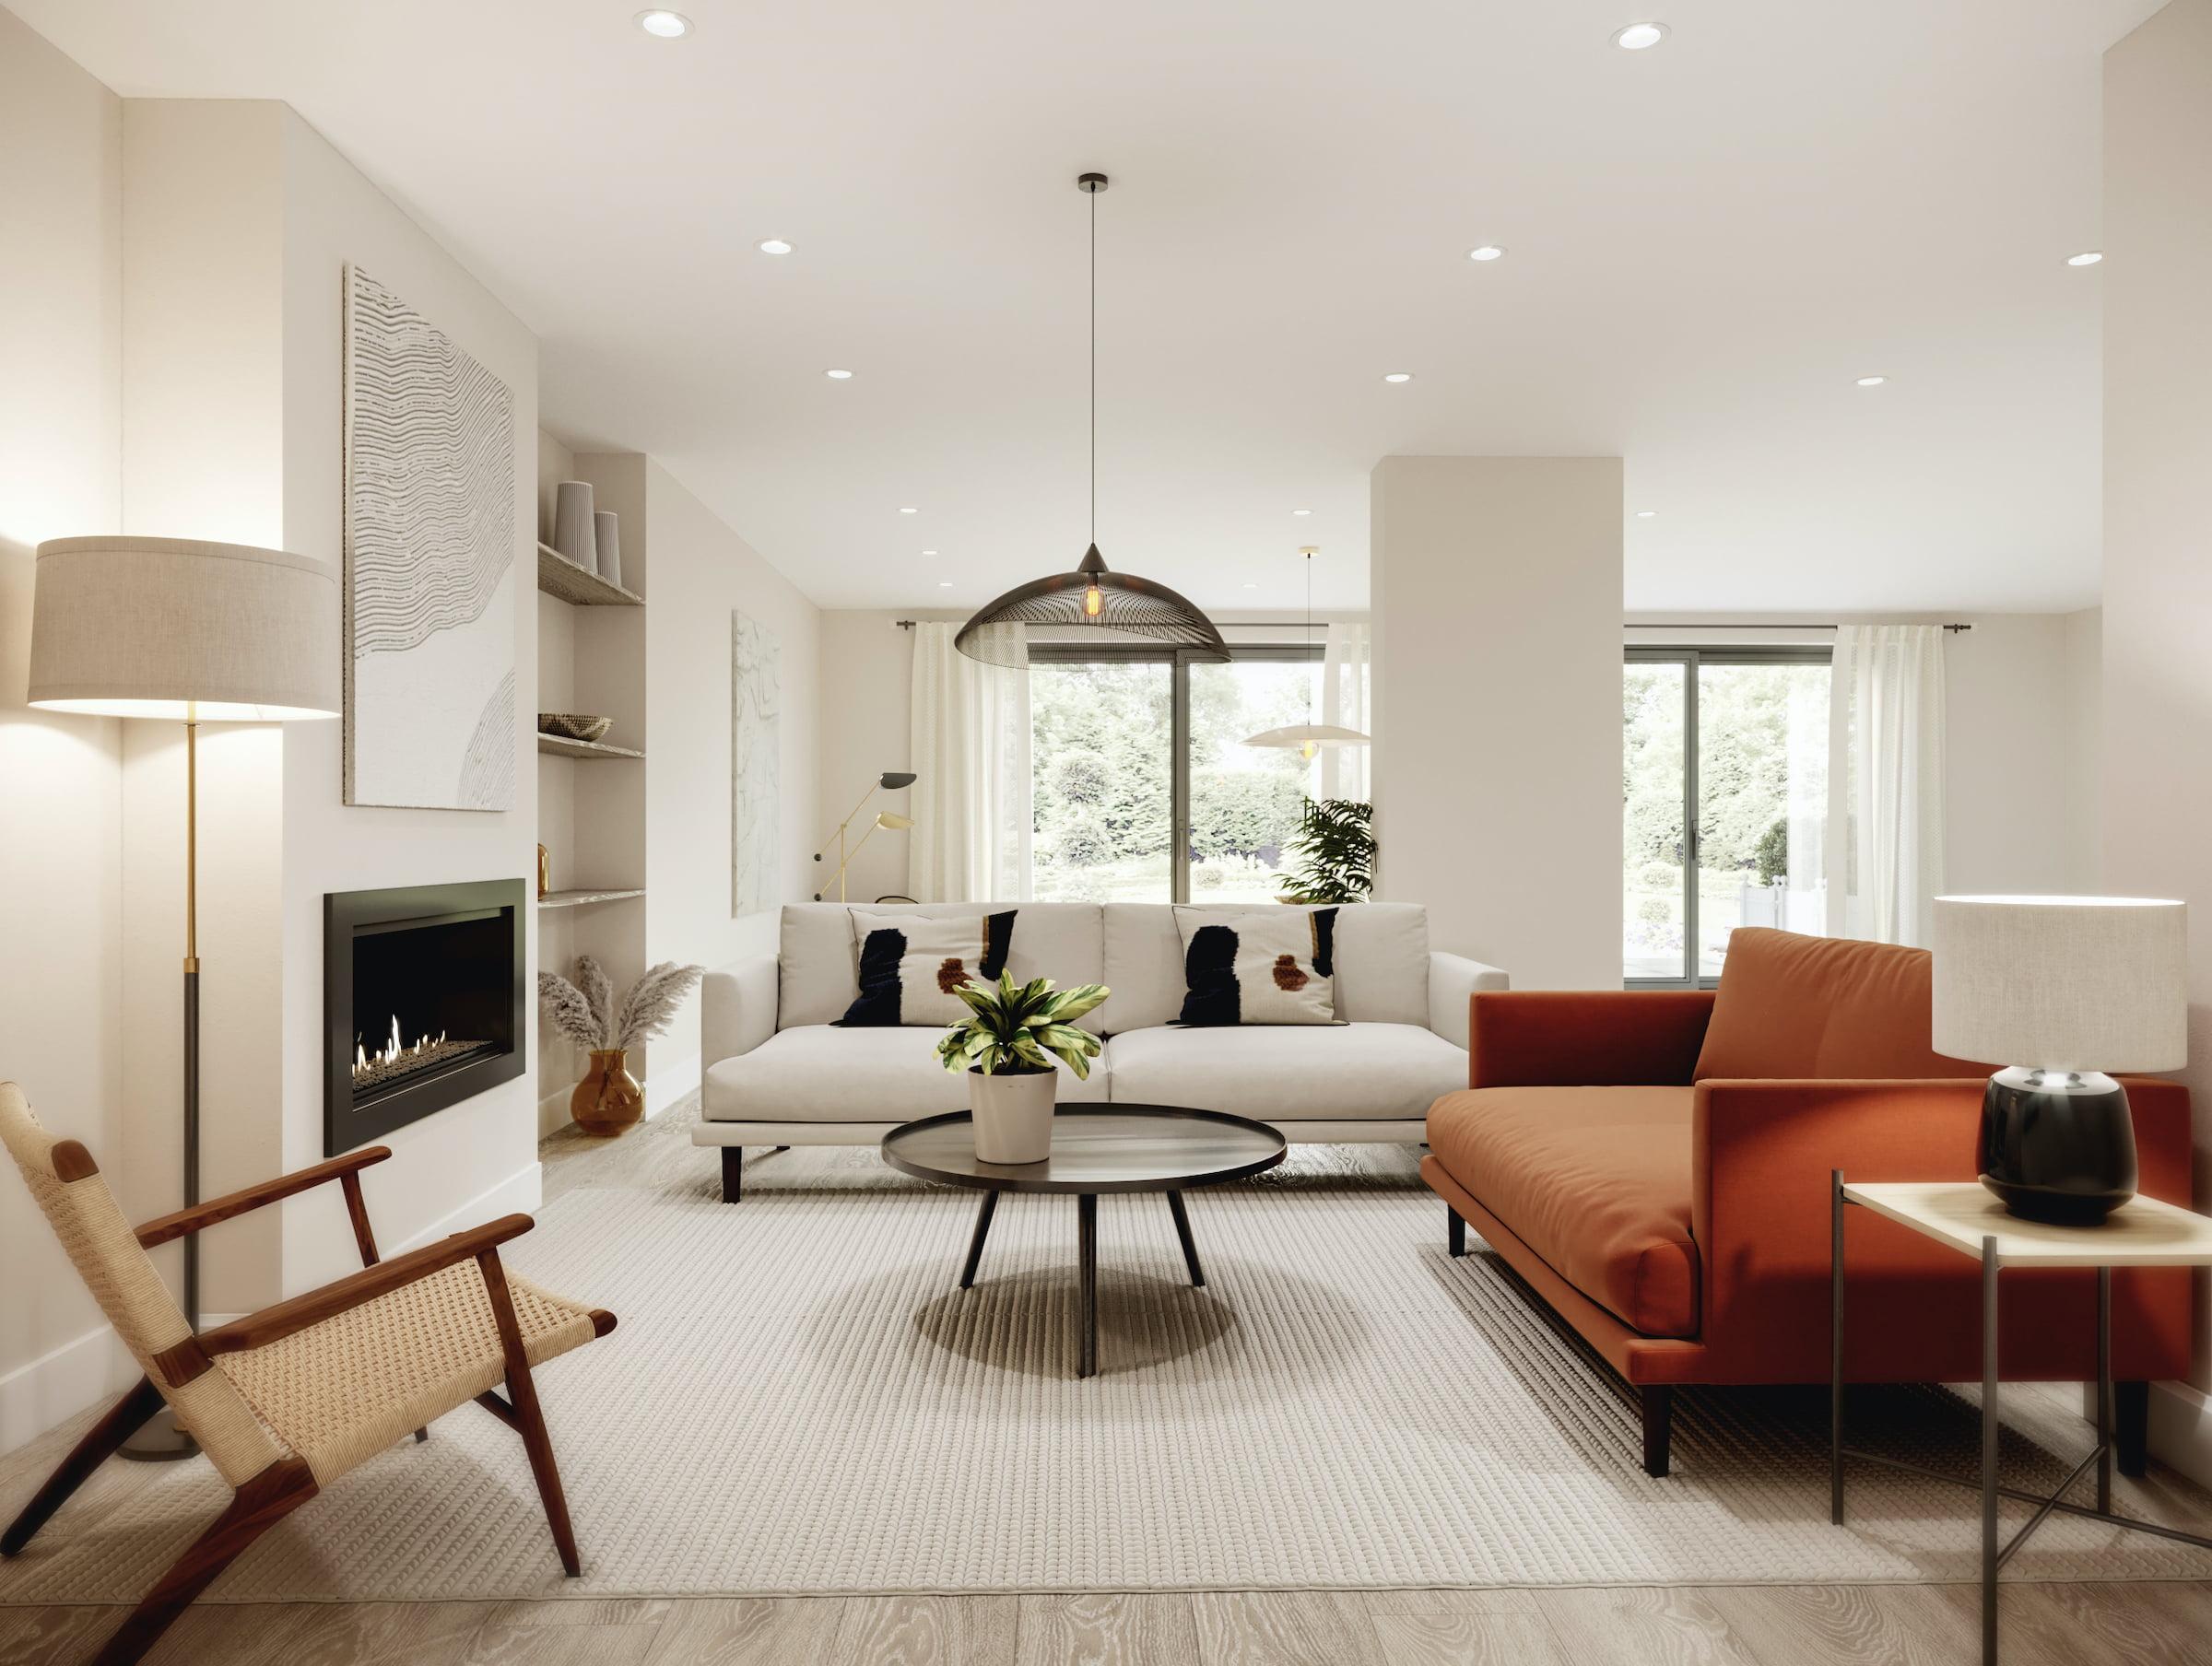 Minimalistic living room design